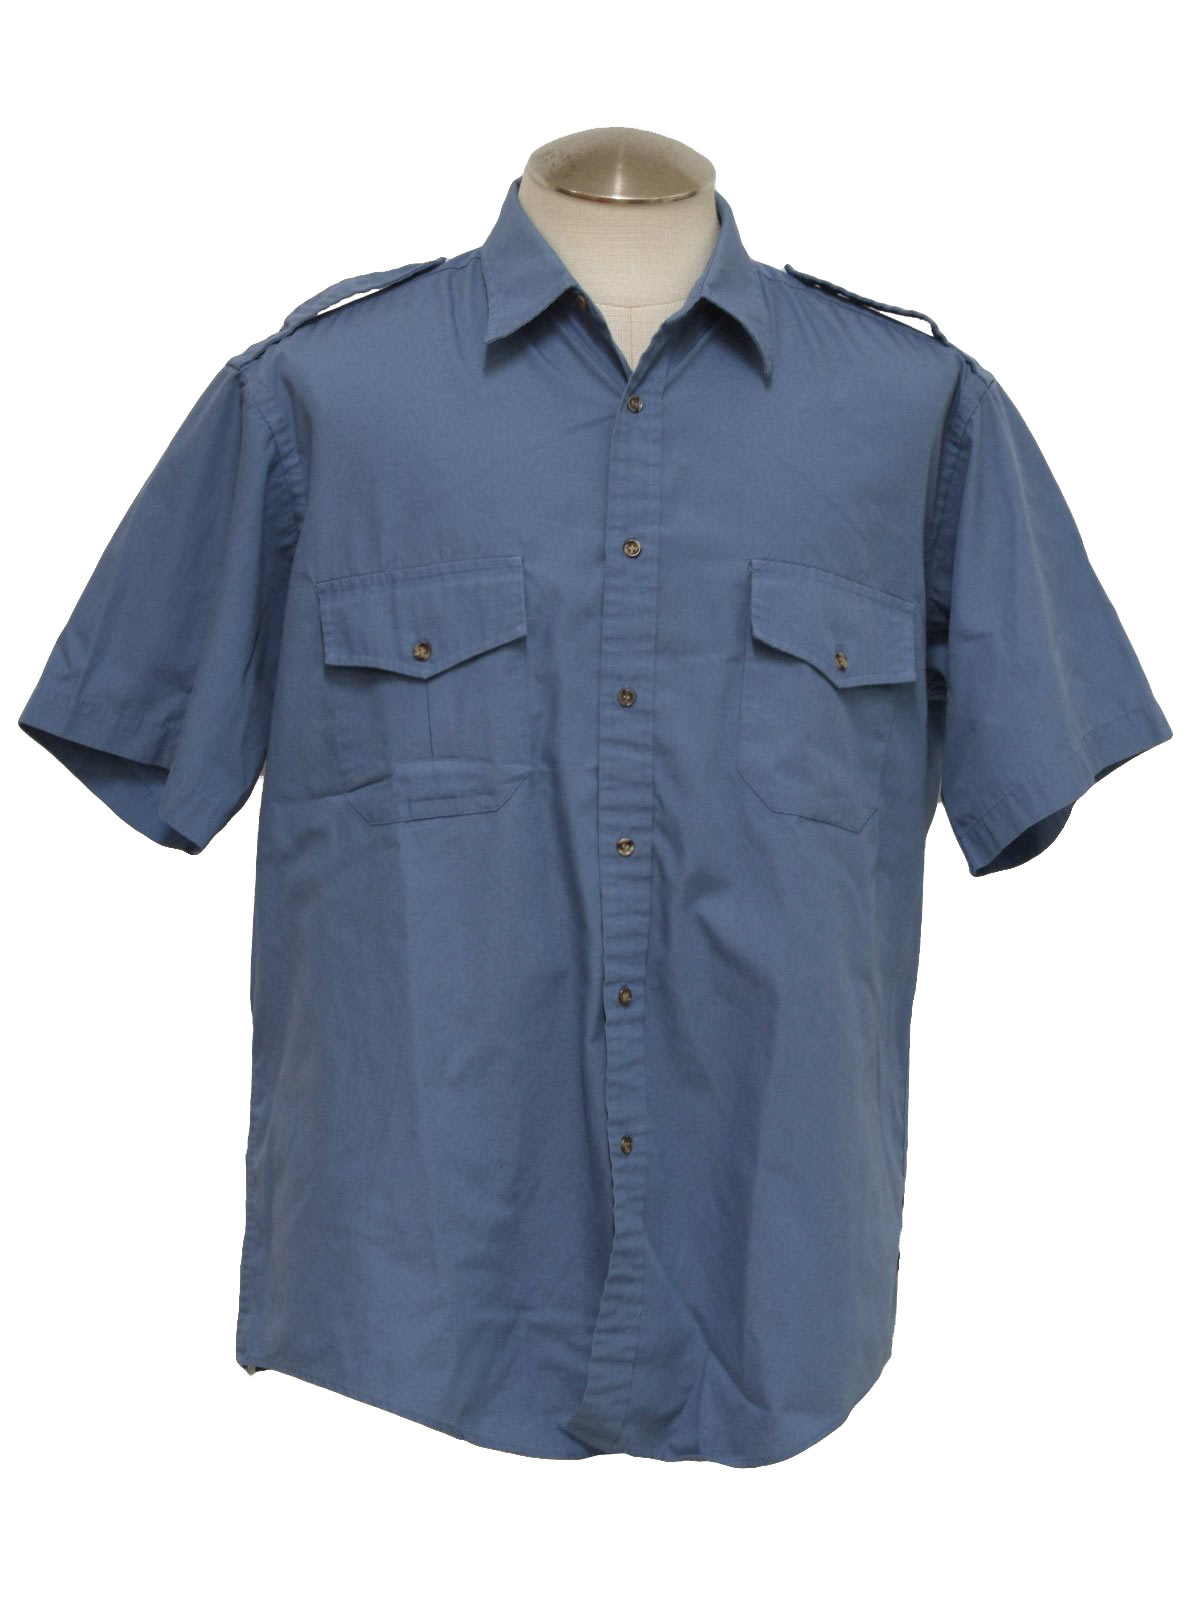 Van Heusen Mens Shirts